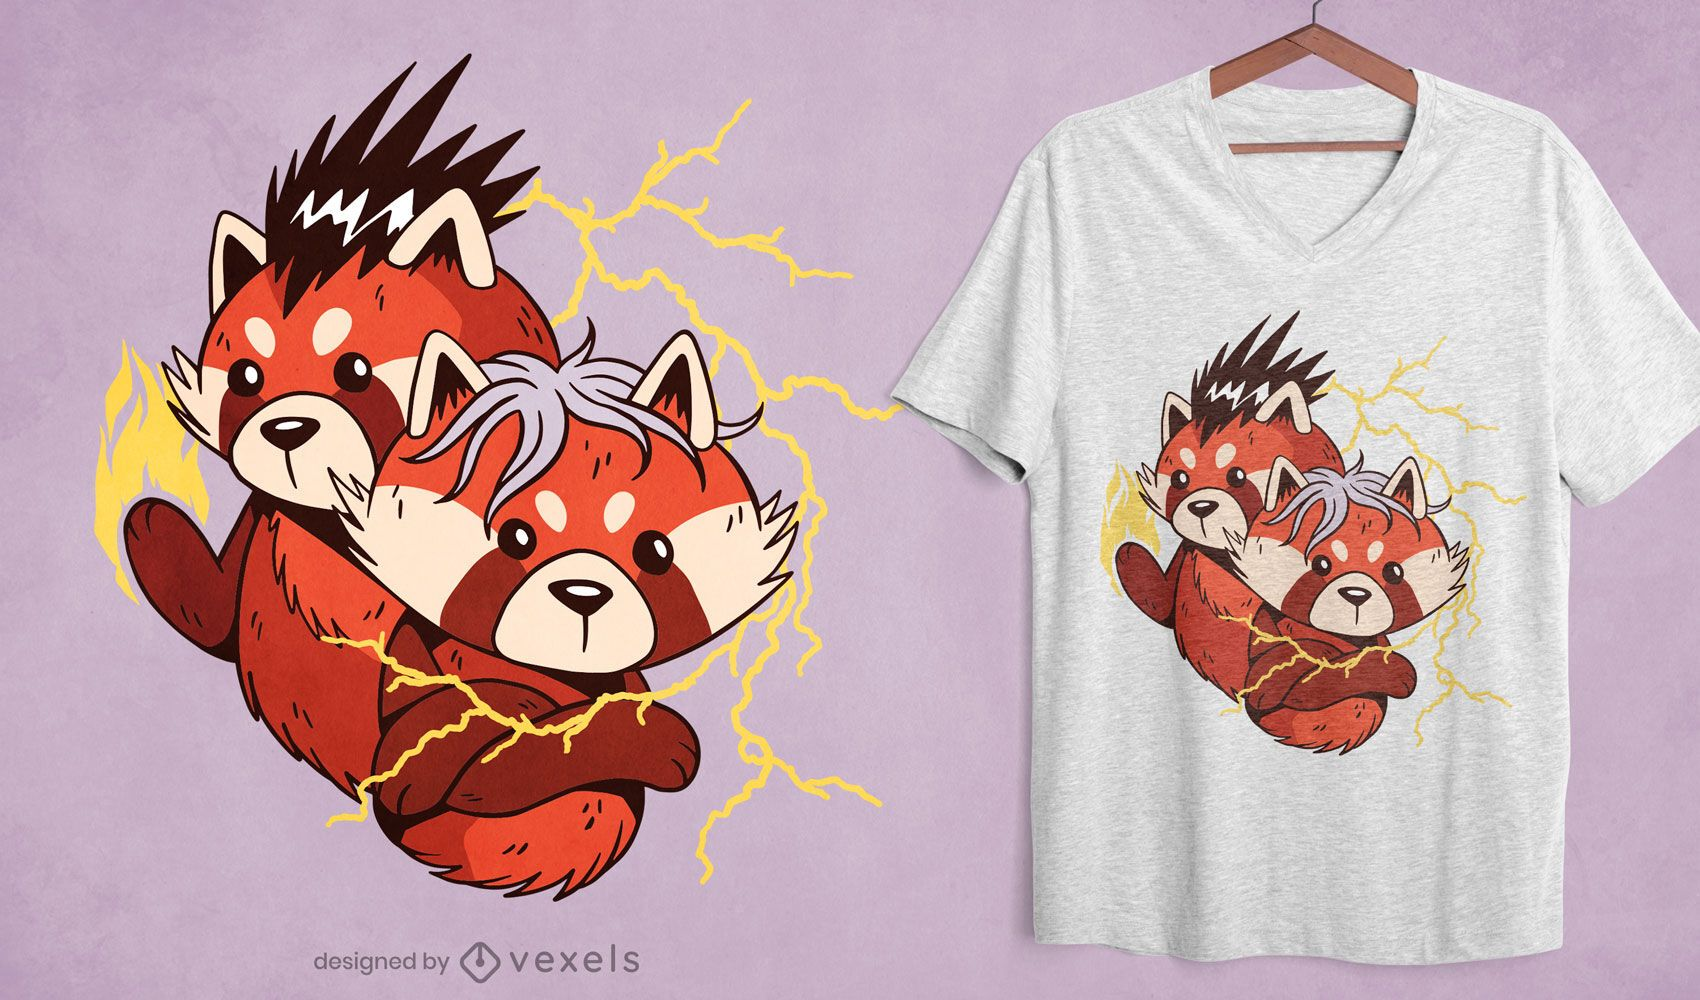 Potente diseño de camiseta de dibujos animados de panda rojo